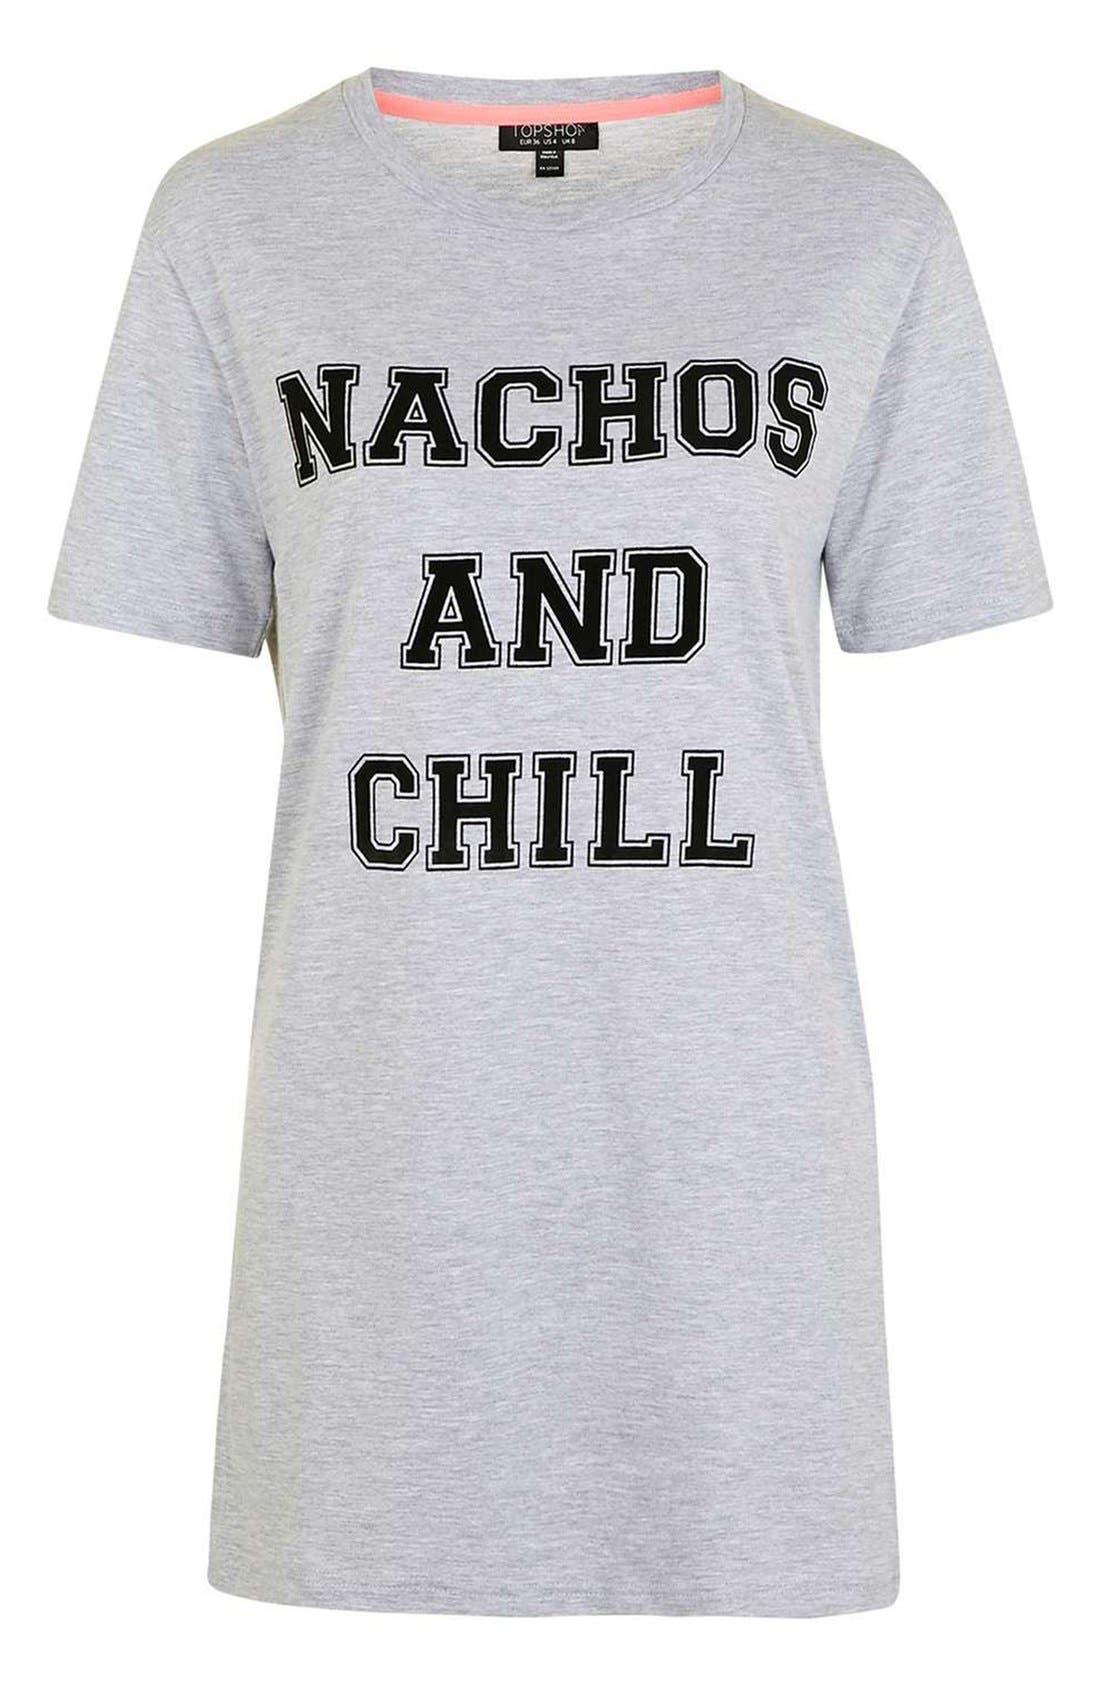 Alternate Image 4  - Topshop Nachos and Chill Sleep Shirt